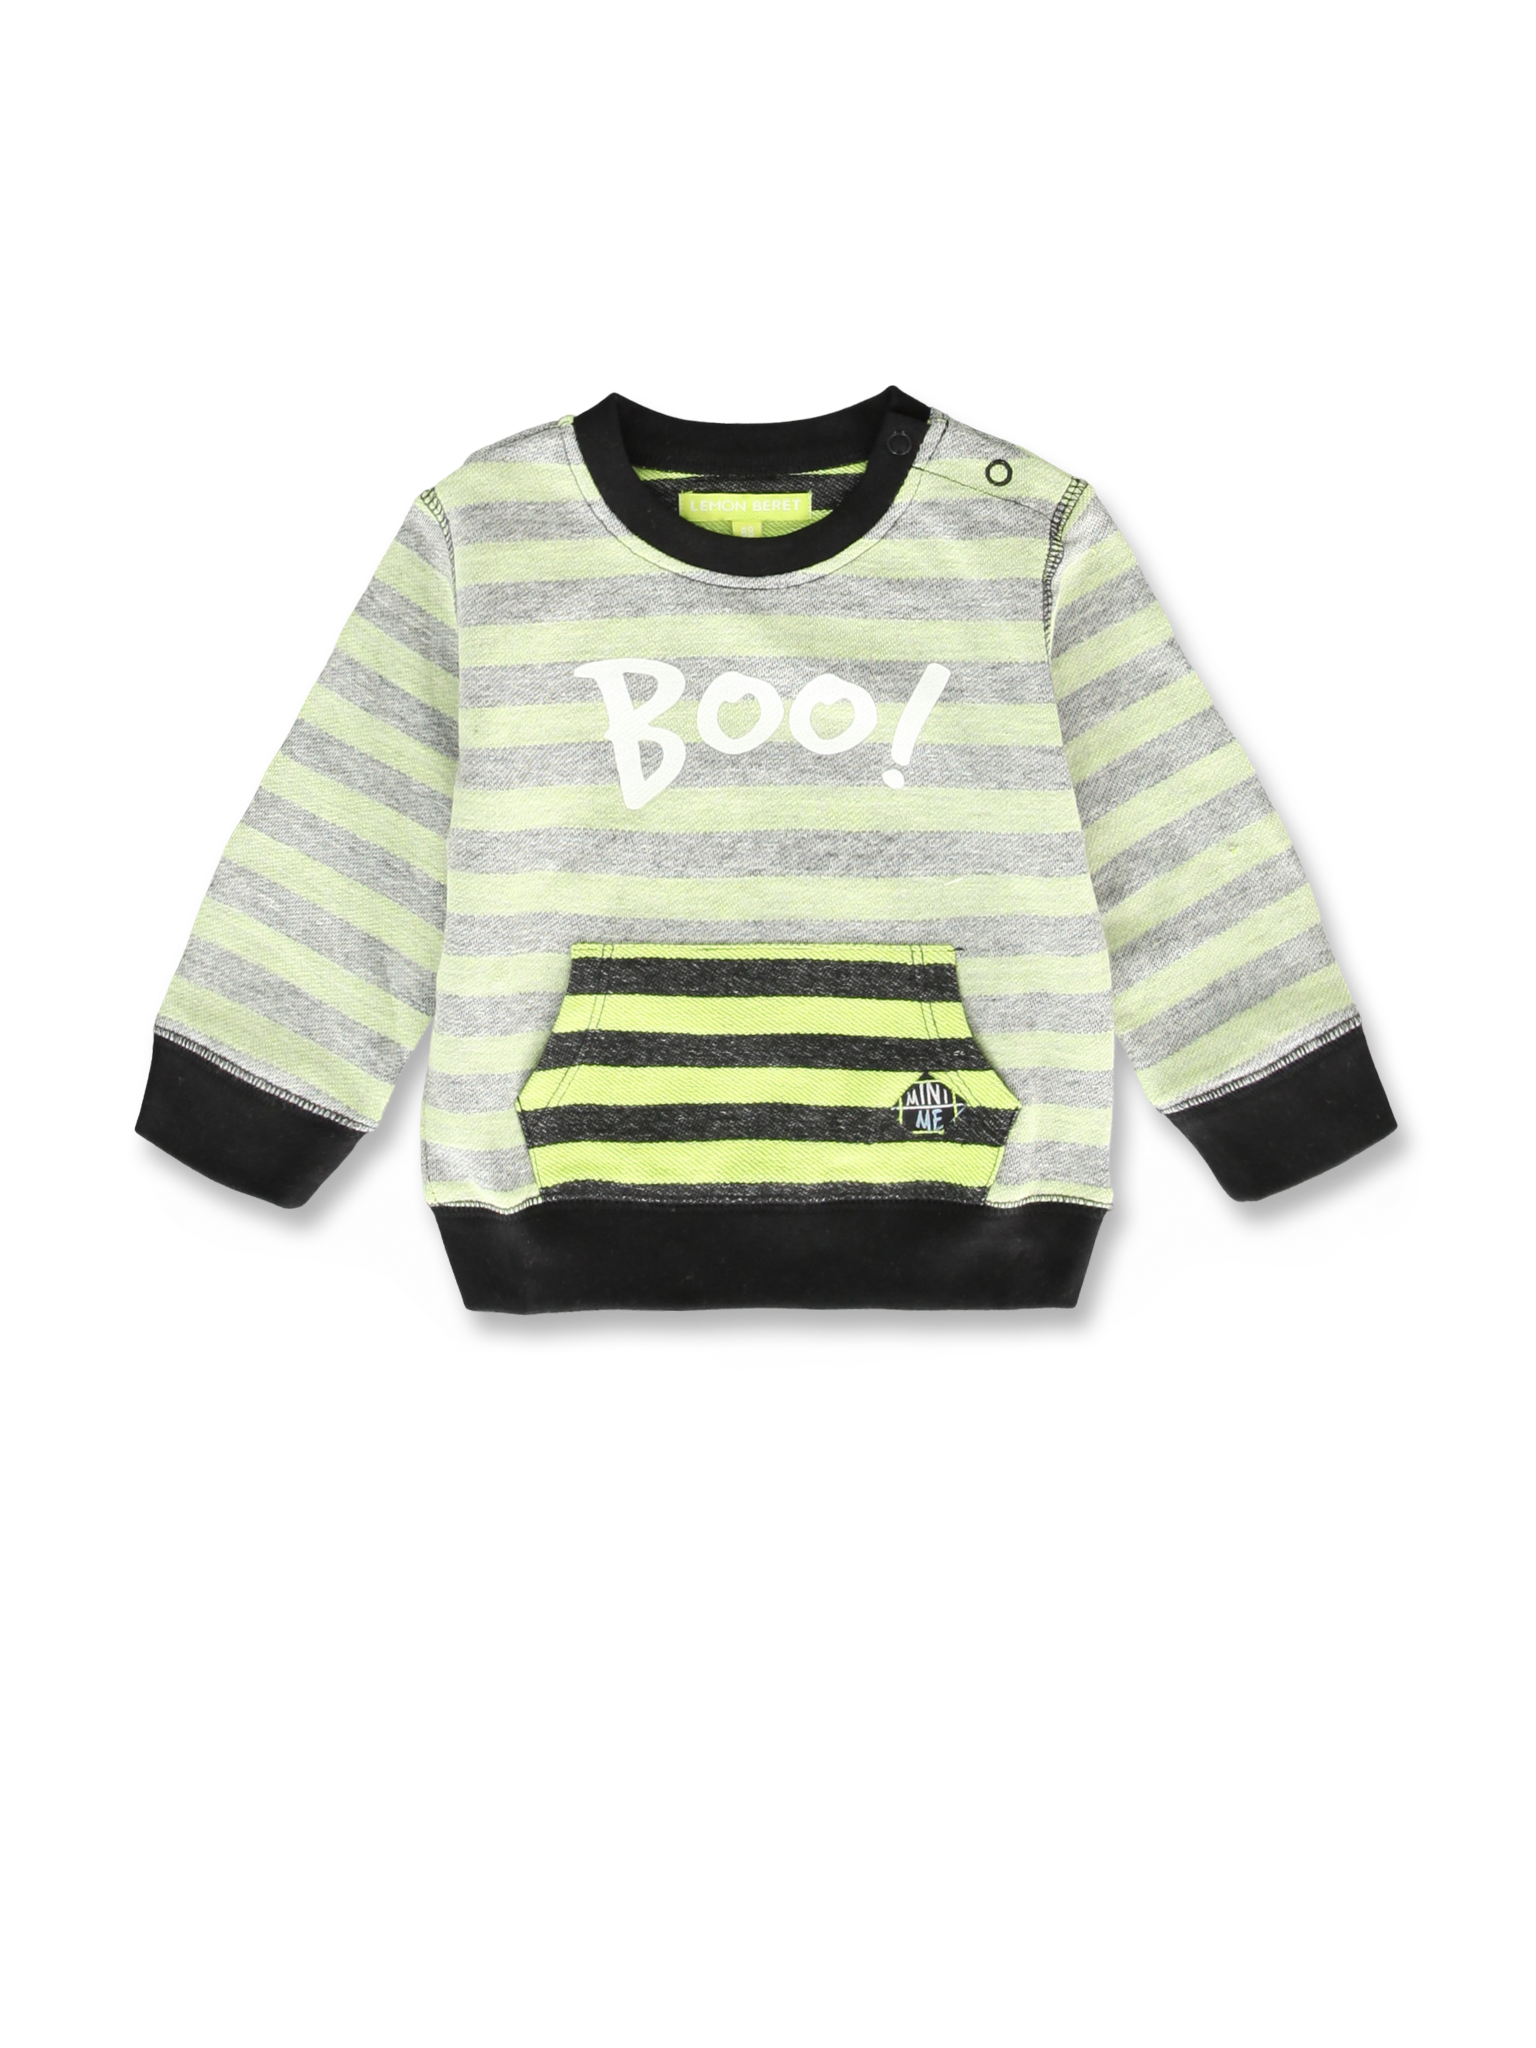 Lemon Beret | Winter 2019 Baby | Sweatshirt | 8 pcs/box